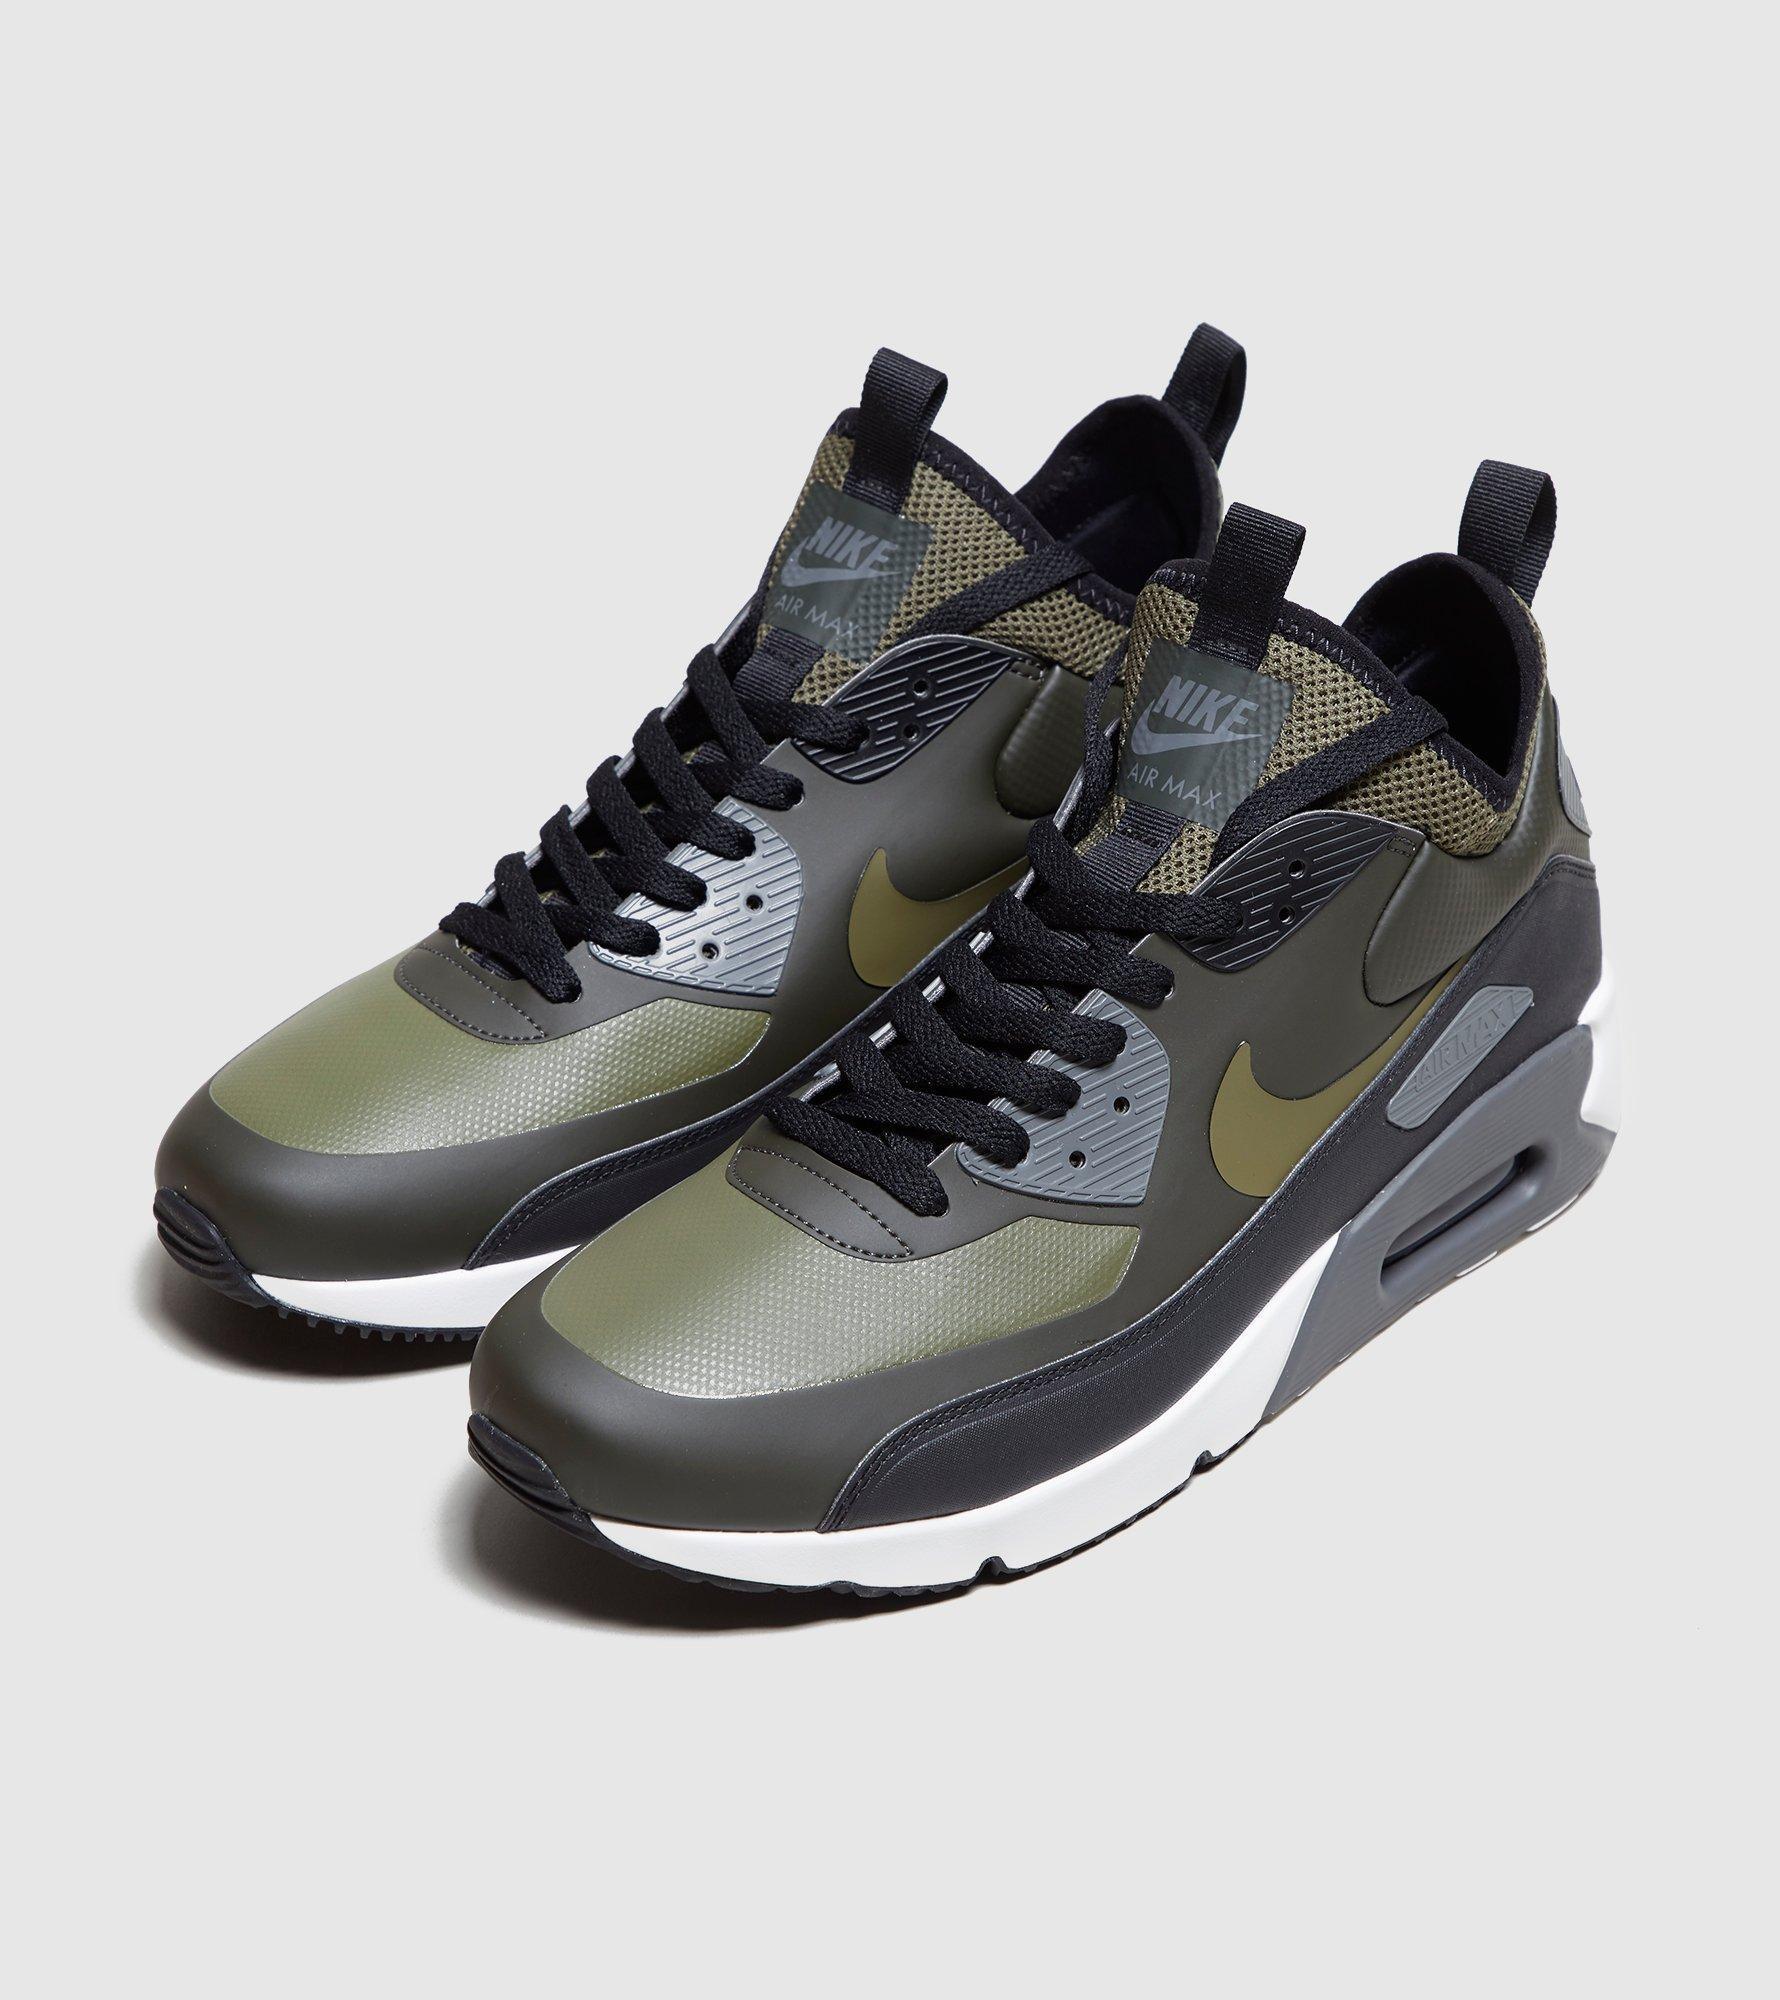 Nike Air Max Gris 1 Ultra Chaussures Essentiels San Carlos